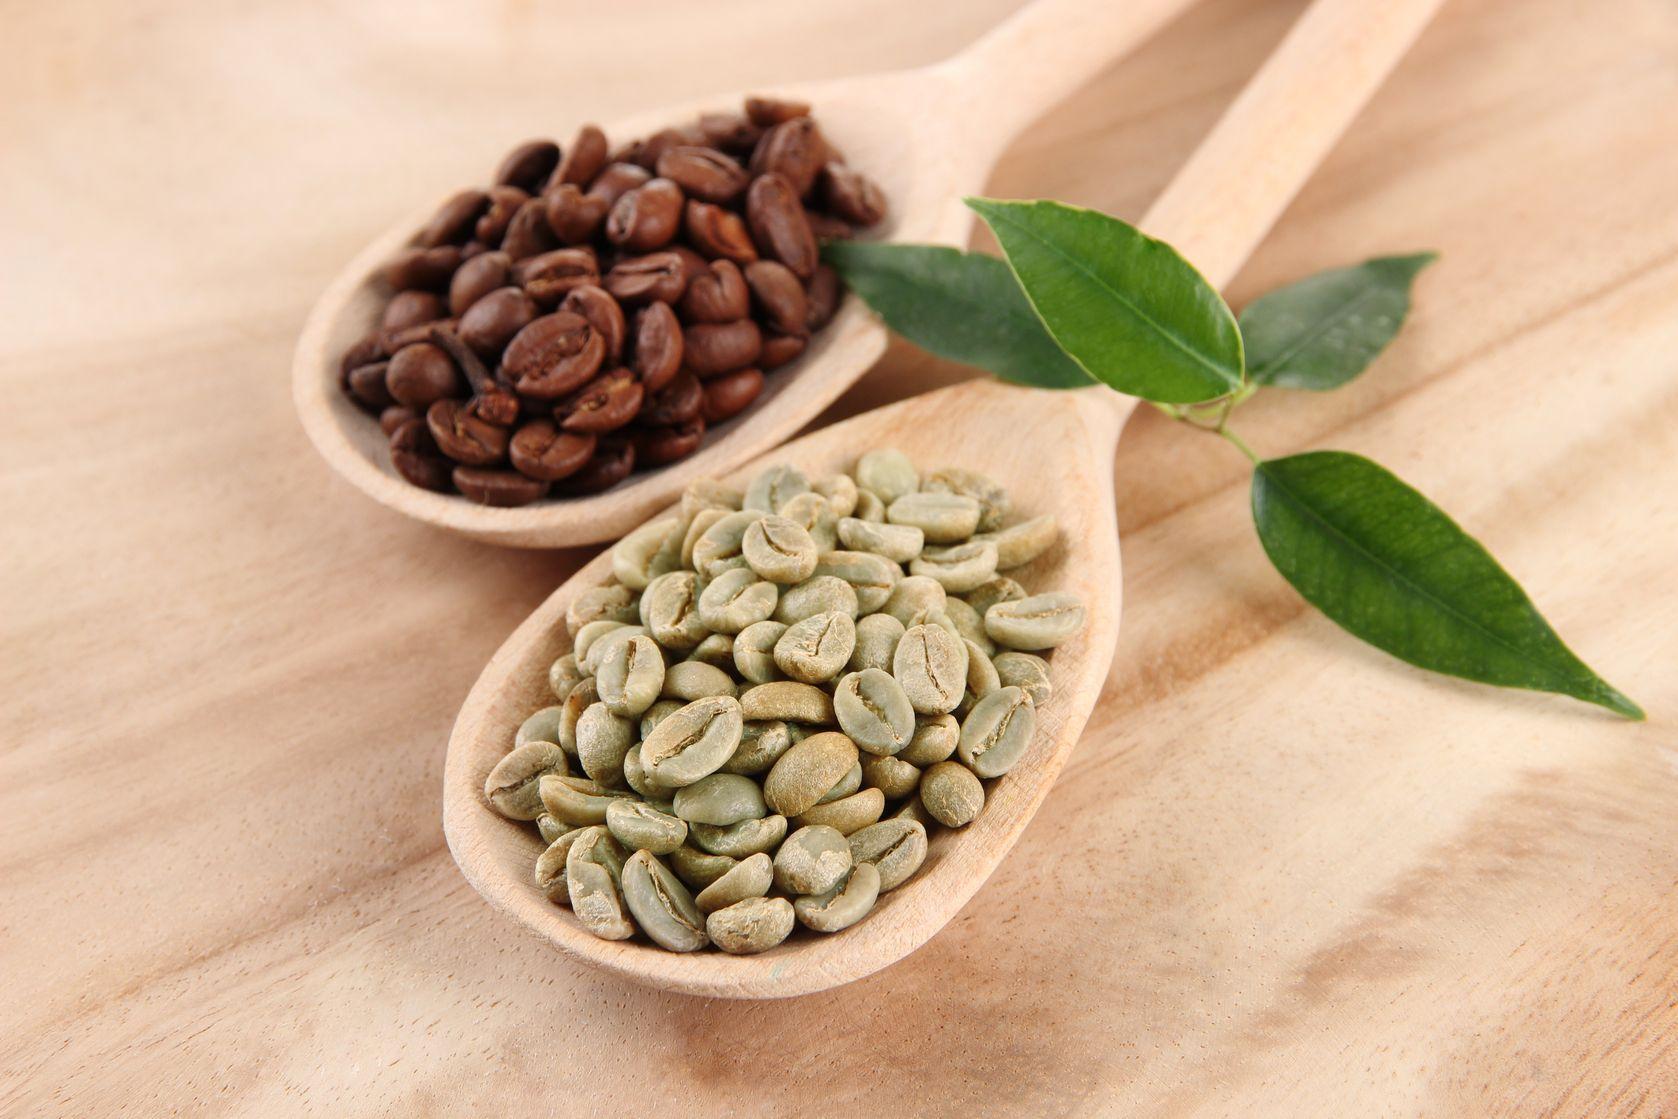 contenuto di caffeina nel caffè verde